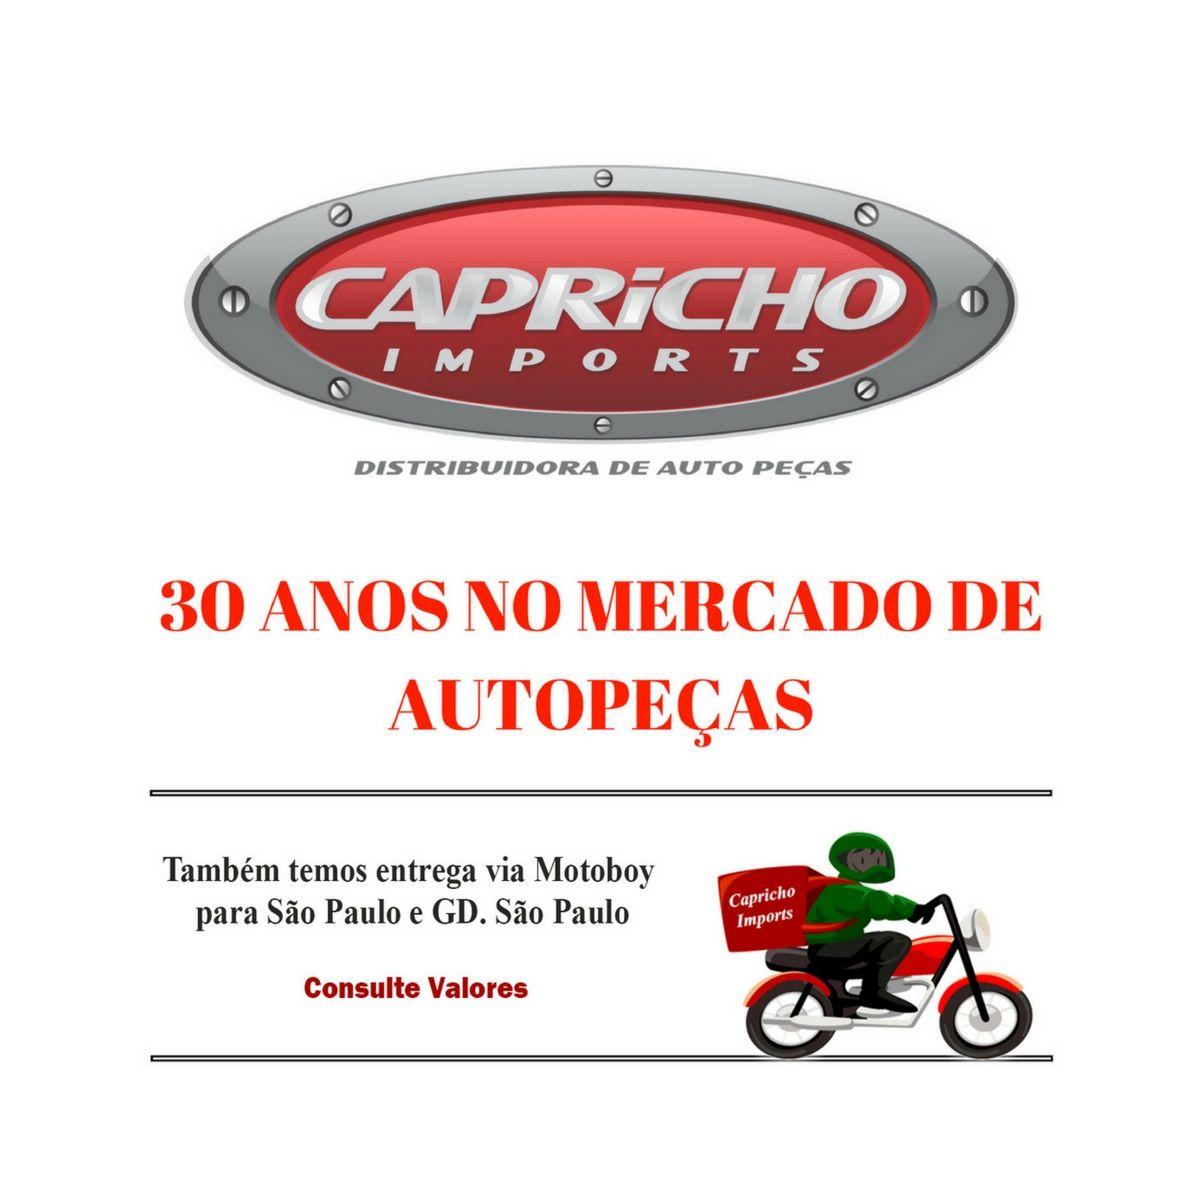 Kit Parafusos Polia do Virabequim - Gol 1000 8V  16V AT - Aço especial